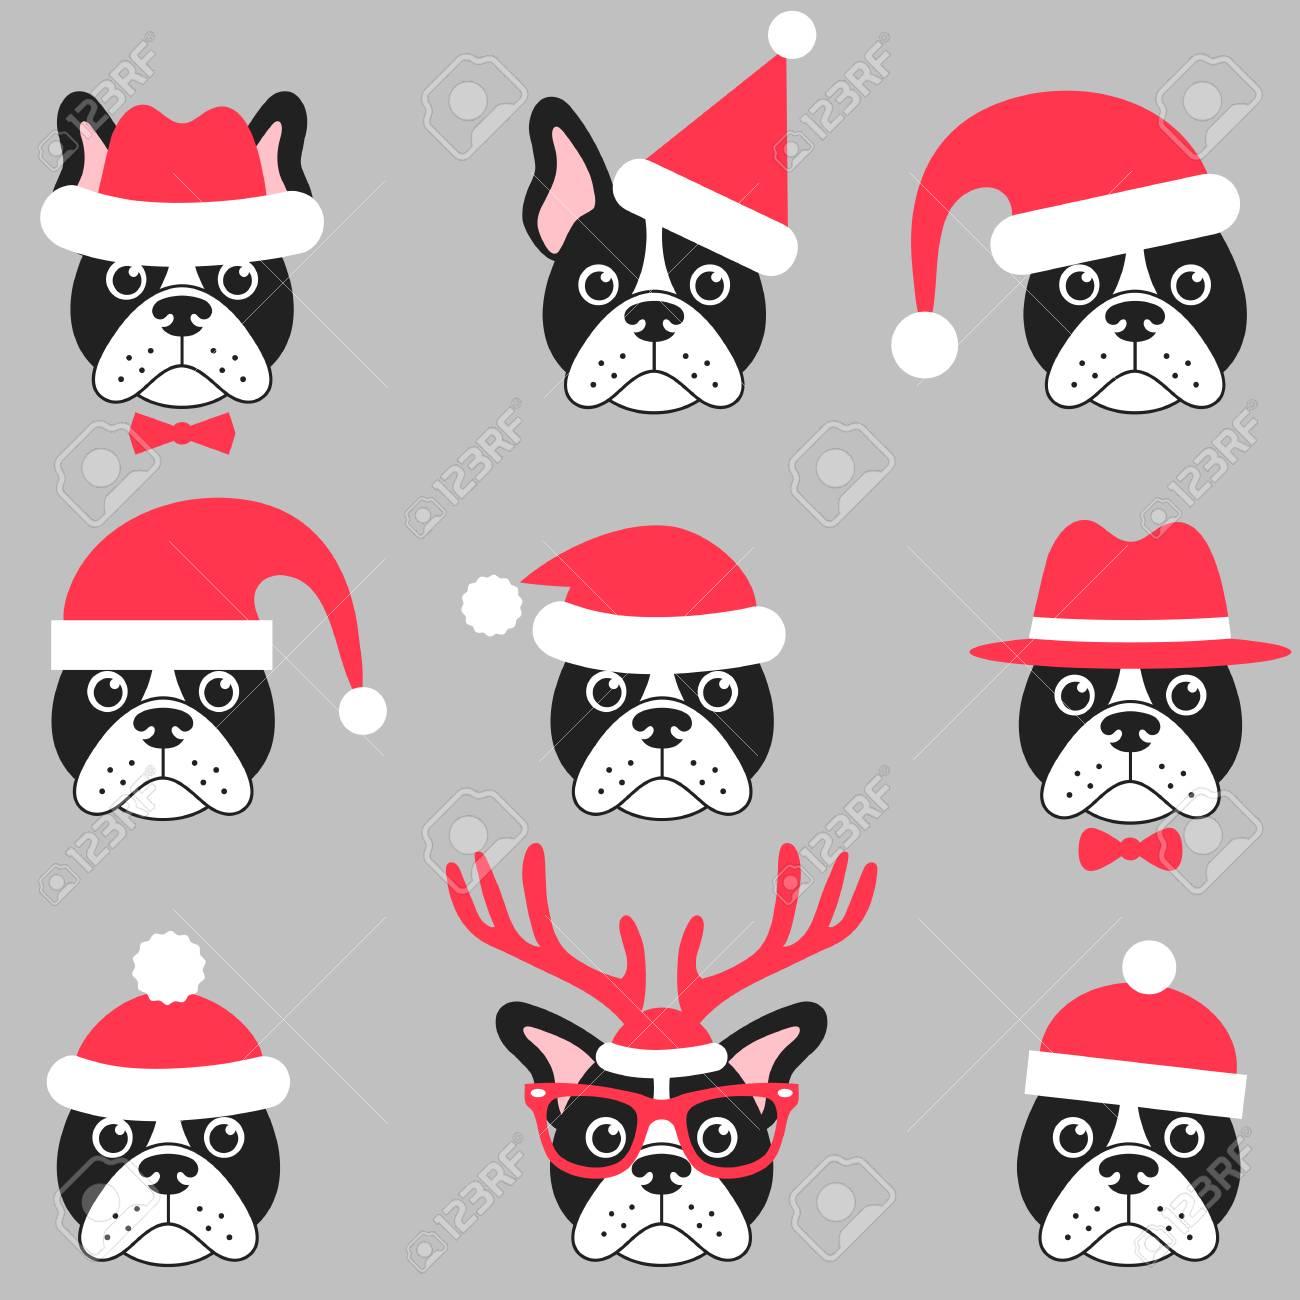 cute french bull dog with red santa hats royalty free cliparts rh 123rf com Cute Christmas Bulldogs English Bulldog Christmas